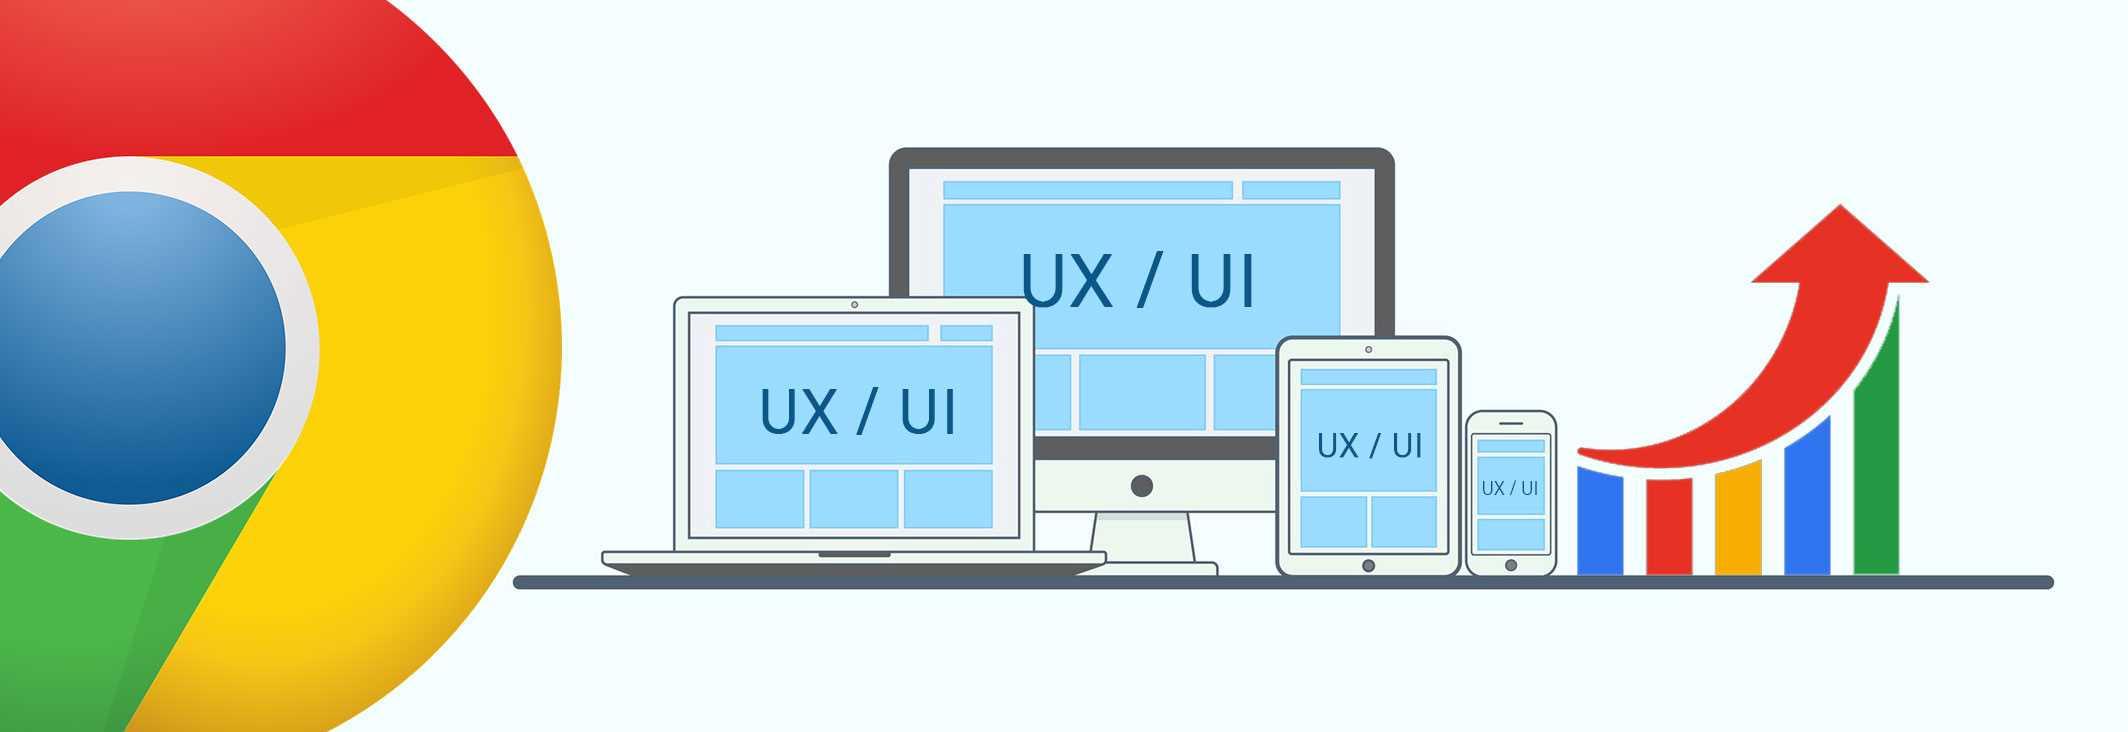 Design-mobile-Google-06-2018